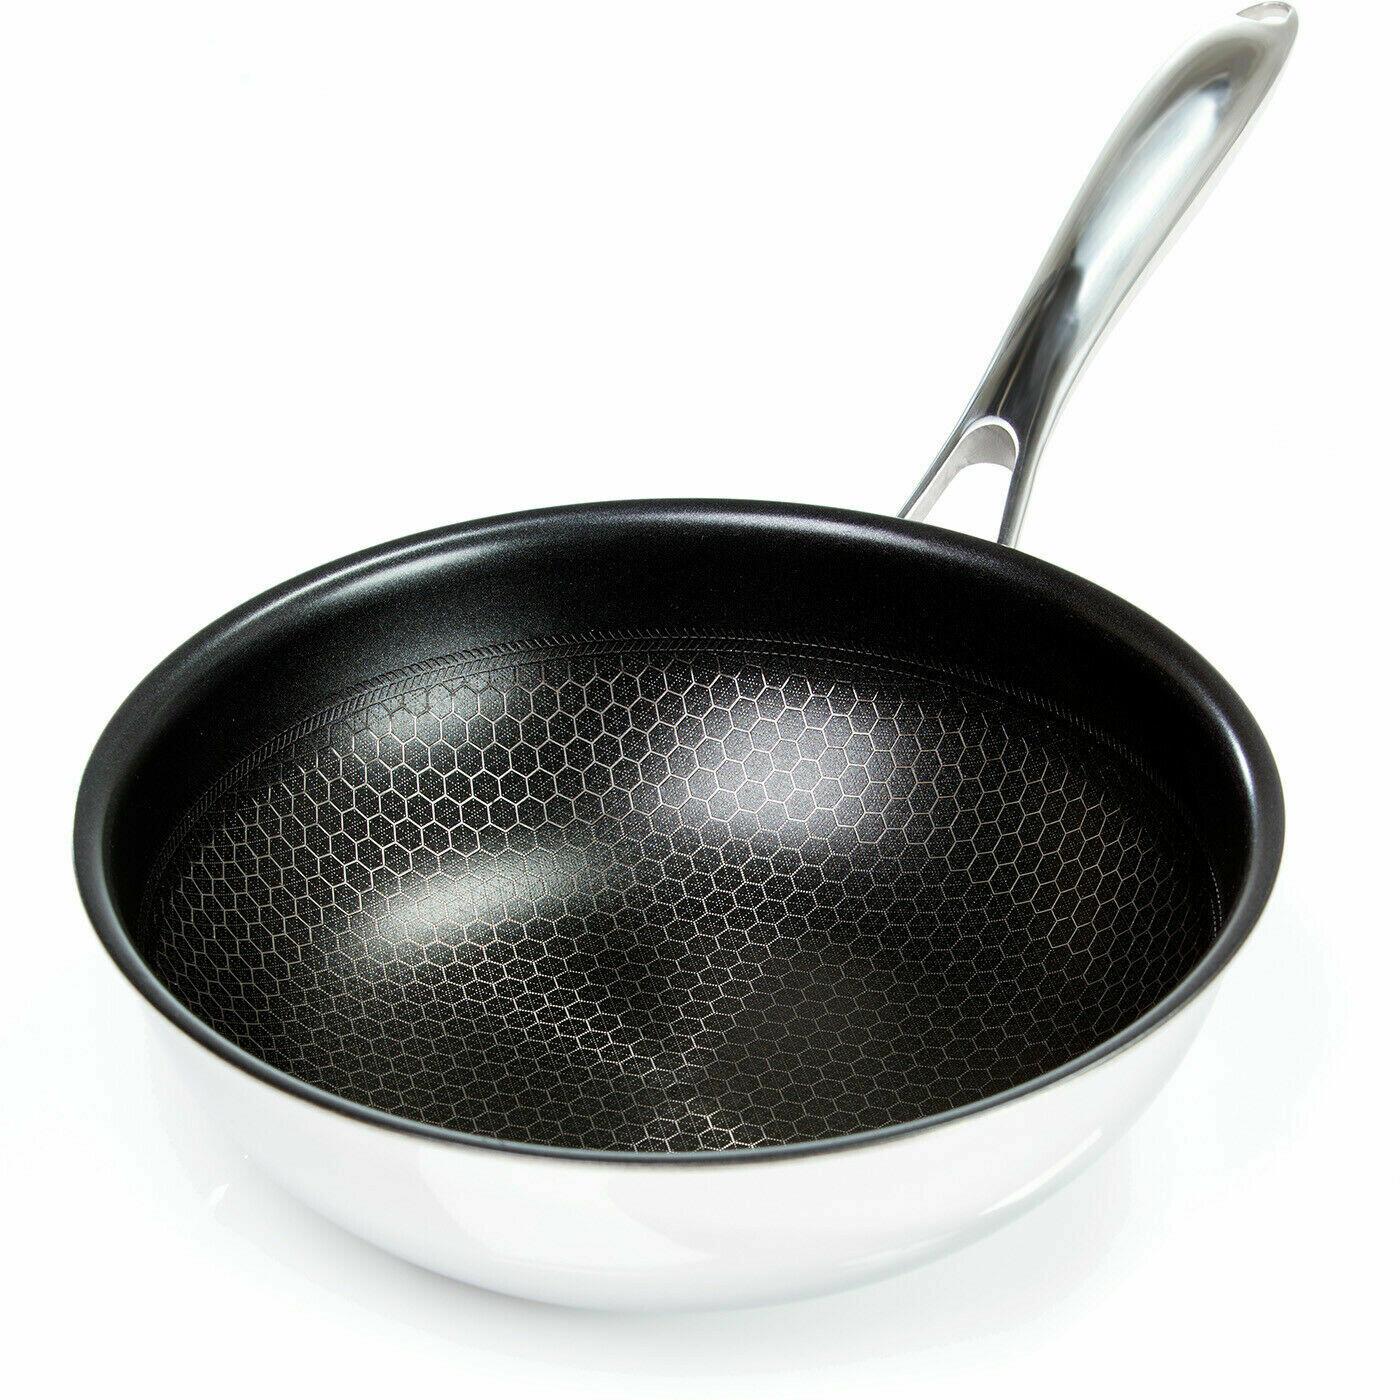 "Frieling Black Cube Chef Pan 9.5"" 2.5 Qt."